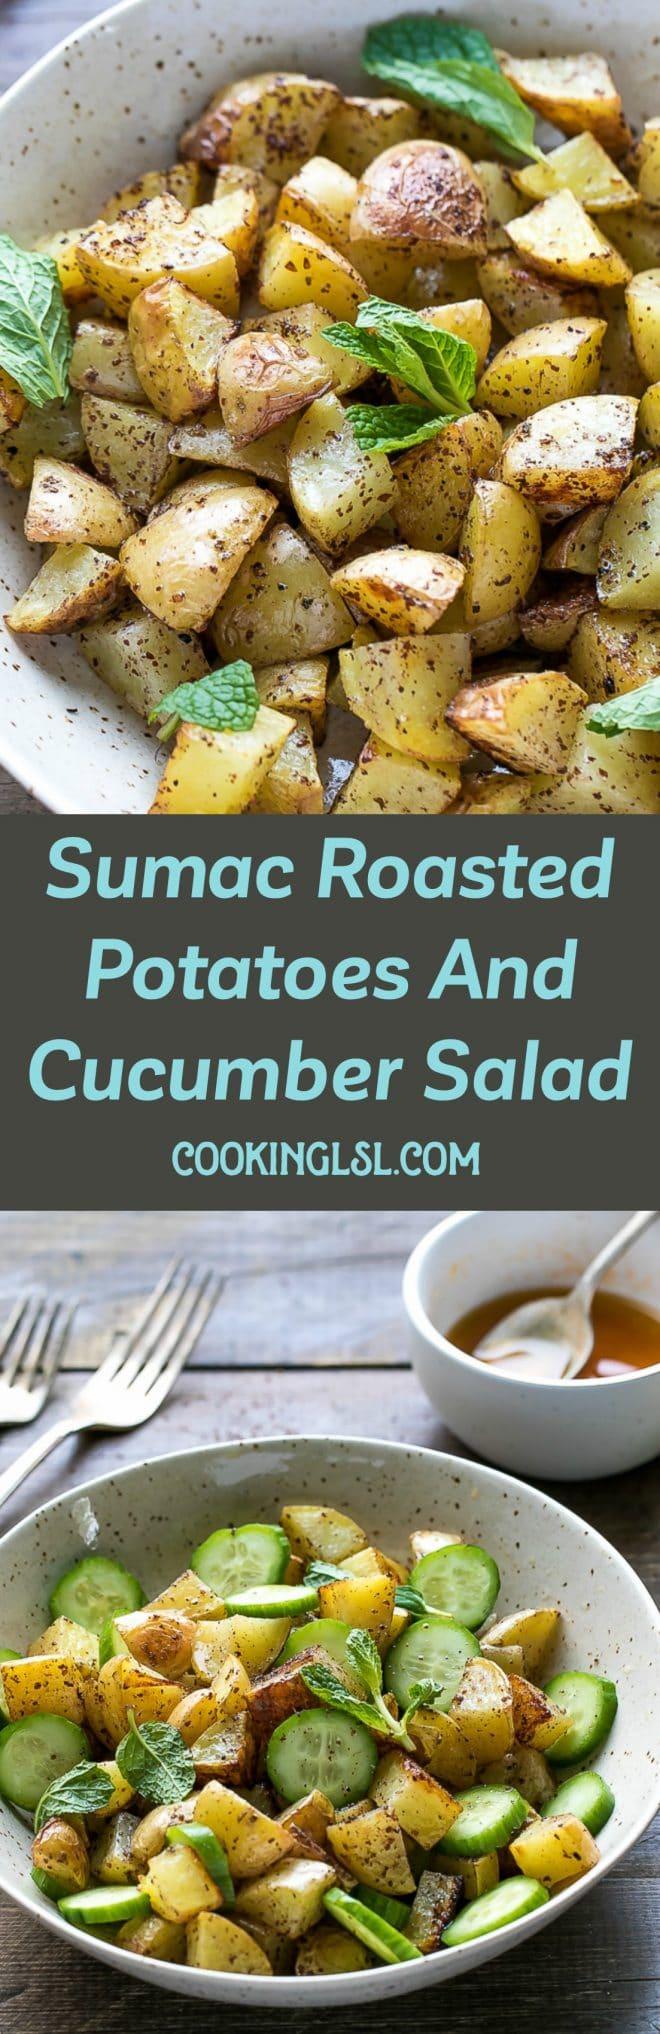 Sumac Roasted Potatoes And Cucumber Salad